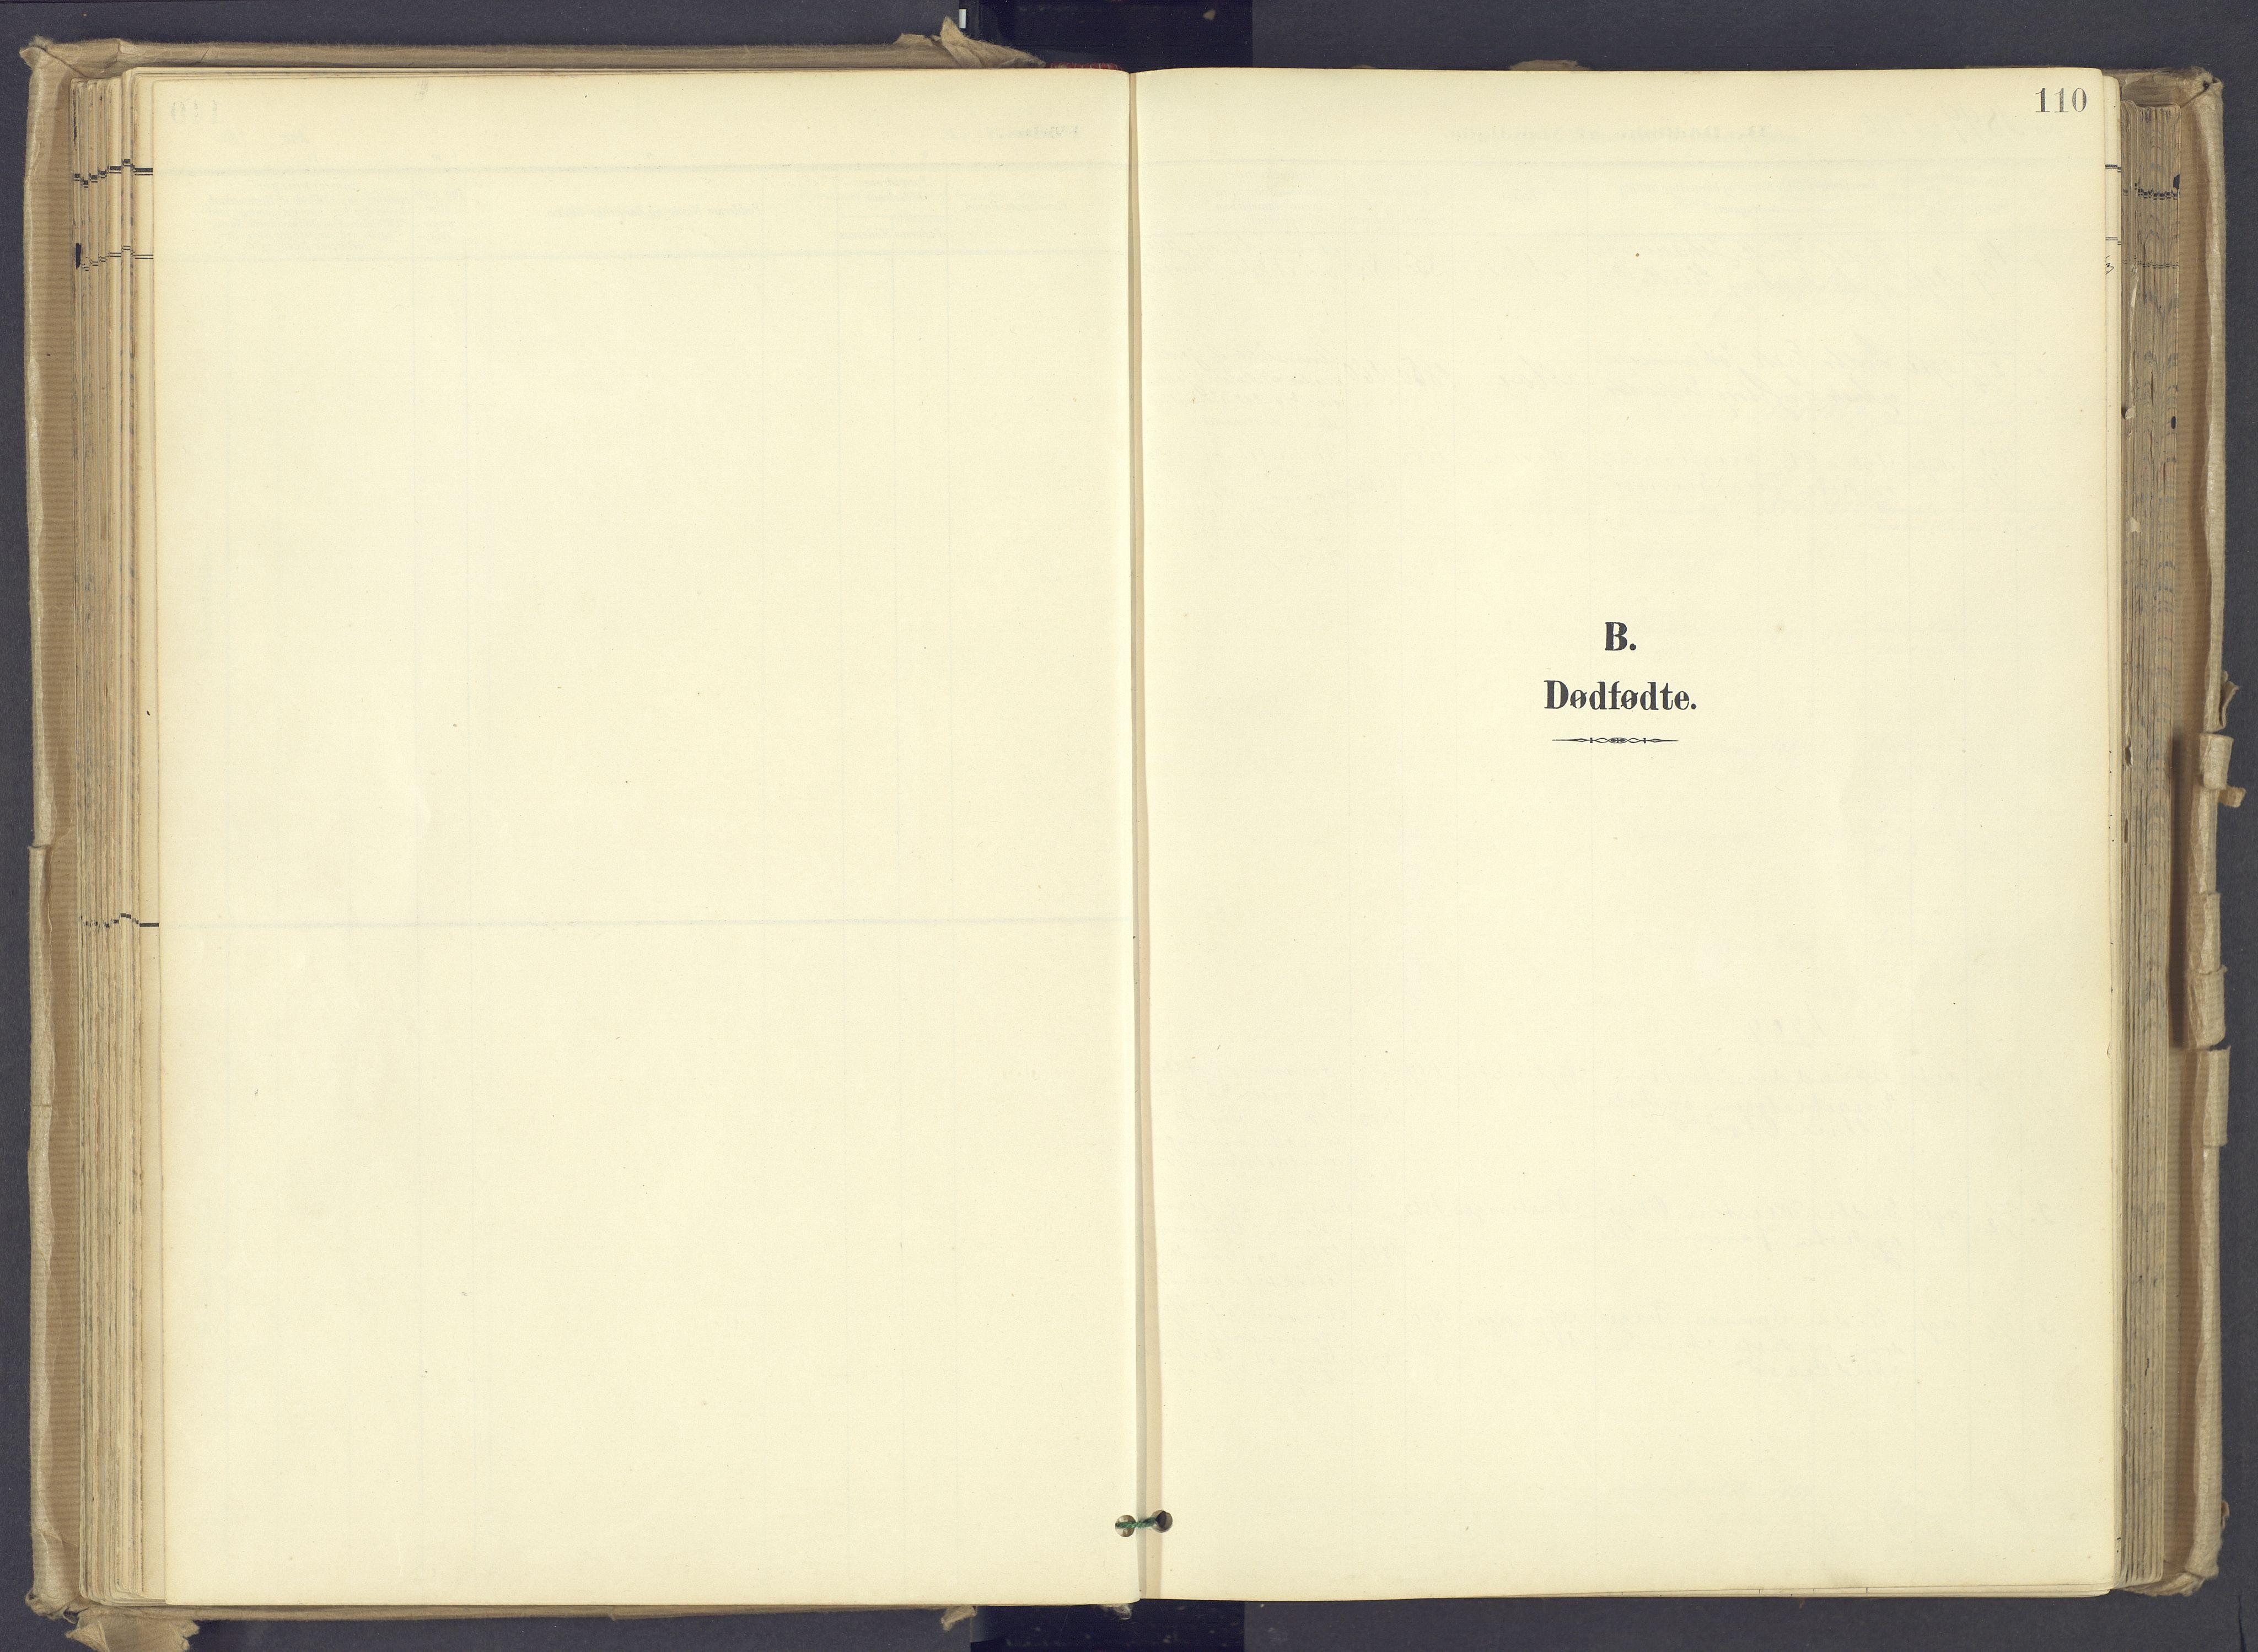 SAH, Øyer prestekontor, Ministerialbok nr. 12, 1897-1920, s. 110